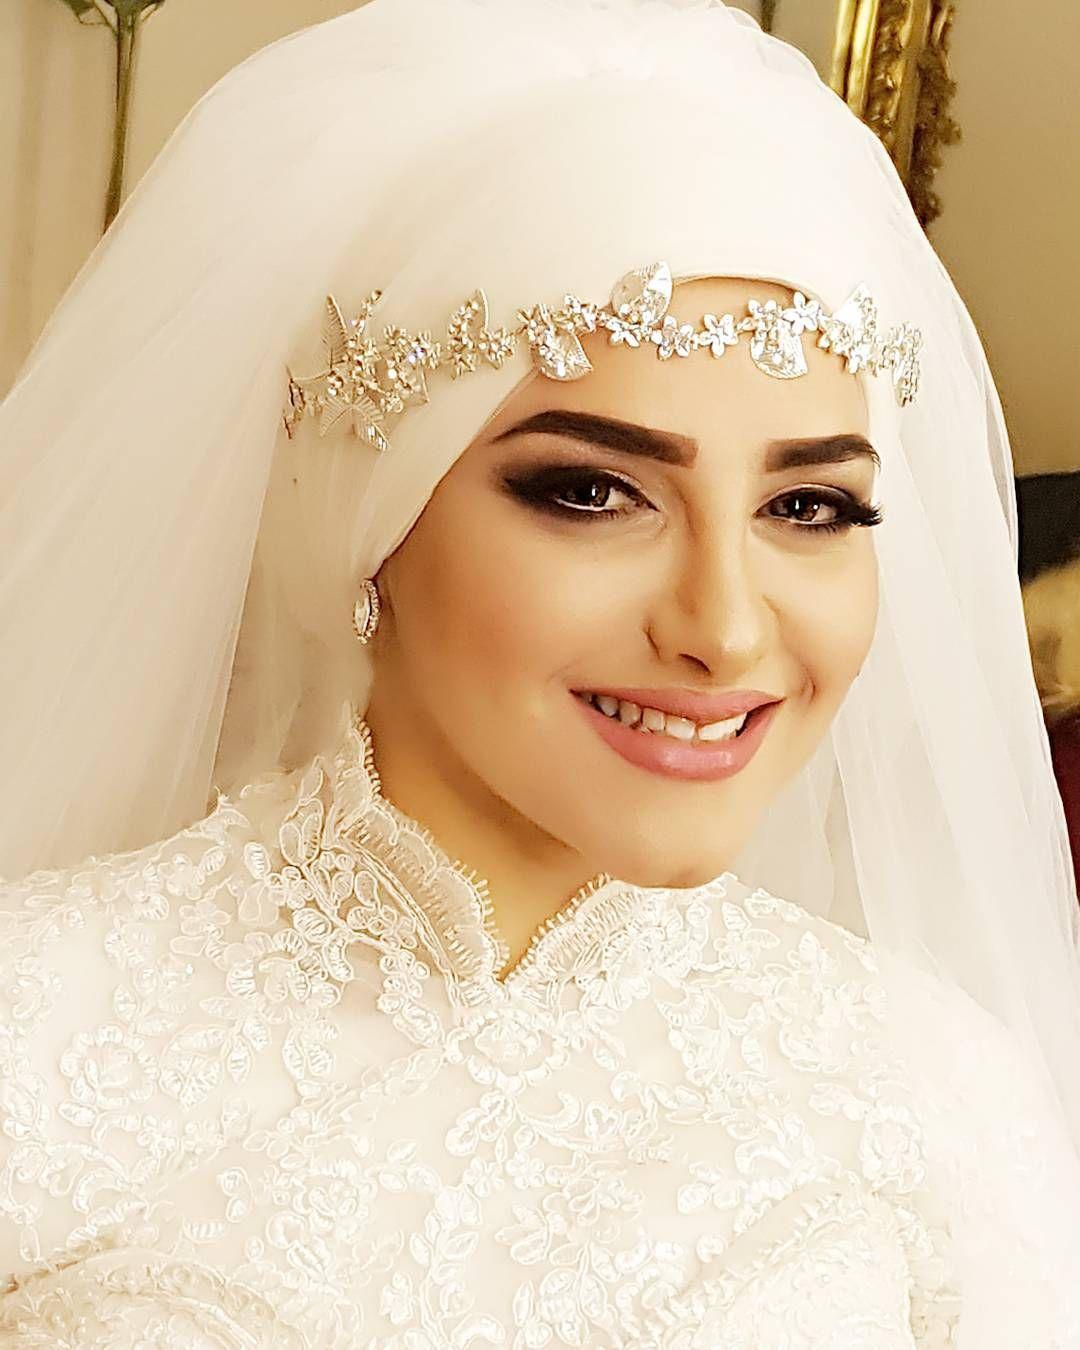 #weddingmakeup #bridal #flawlessmakeup #elegante #2017 #glow #instamakeupartist #lipglos#happy #veil #hendelshishtawy http://gelinshop.com/ipost/1514676946759672123/?code=BUFNqhxFWE7